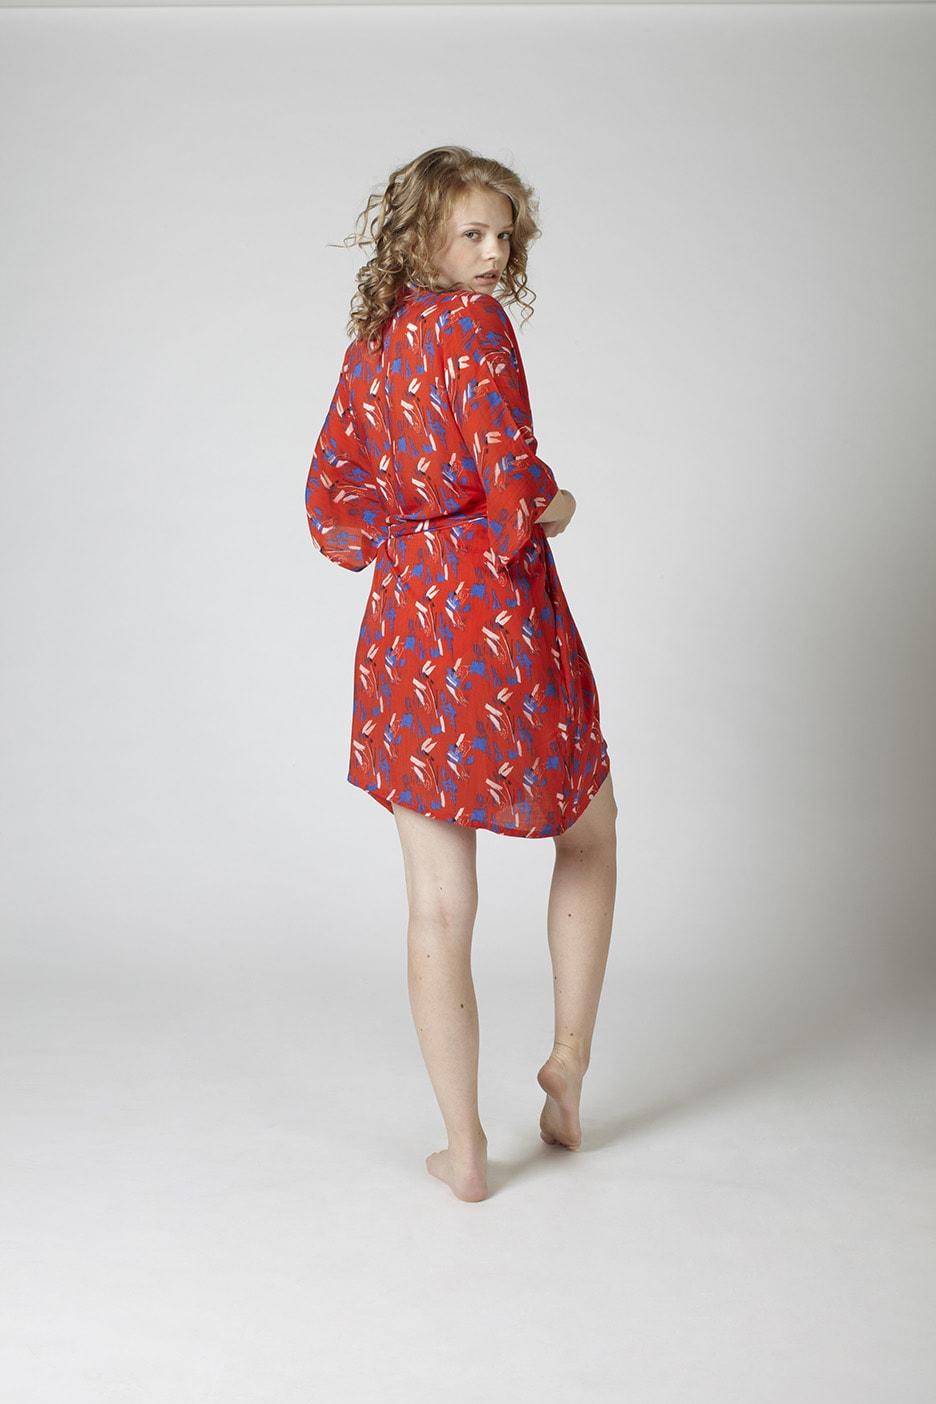 MARGARET AND HERMIONE_Kimono_hands_hinten_EUR 160,00